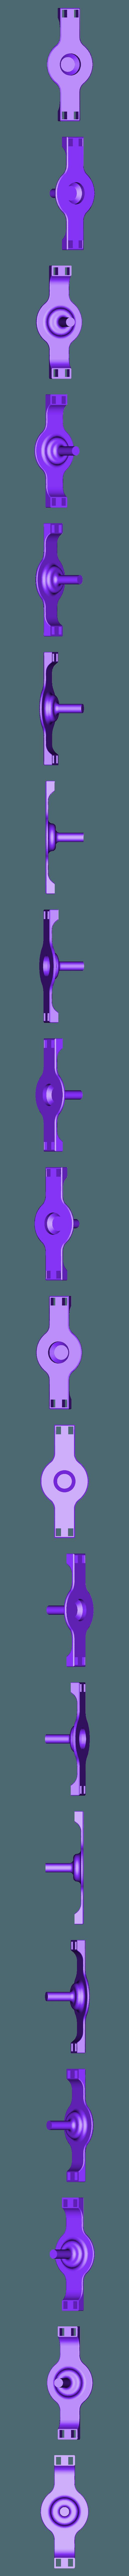 Rotor1.stl Download free STL file basic electric generator • 3D printable design, lukeskymuh